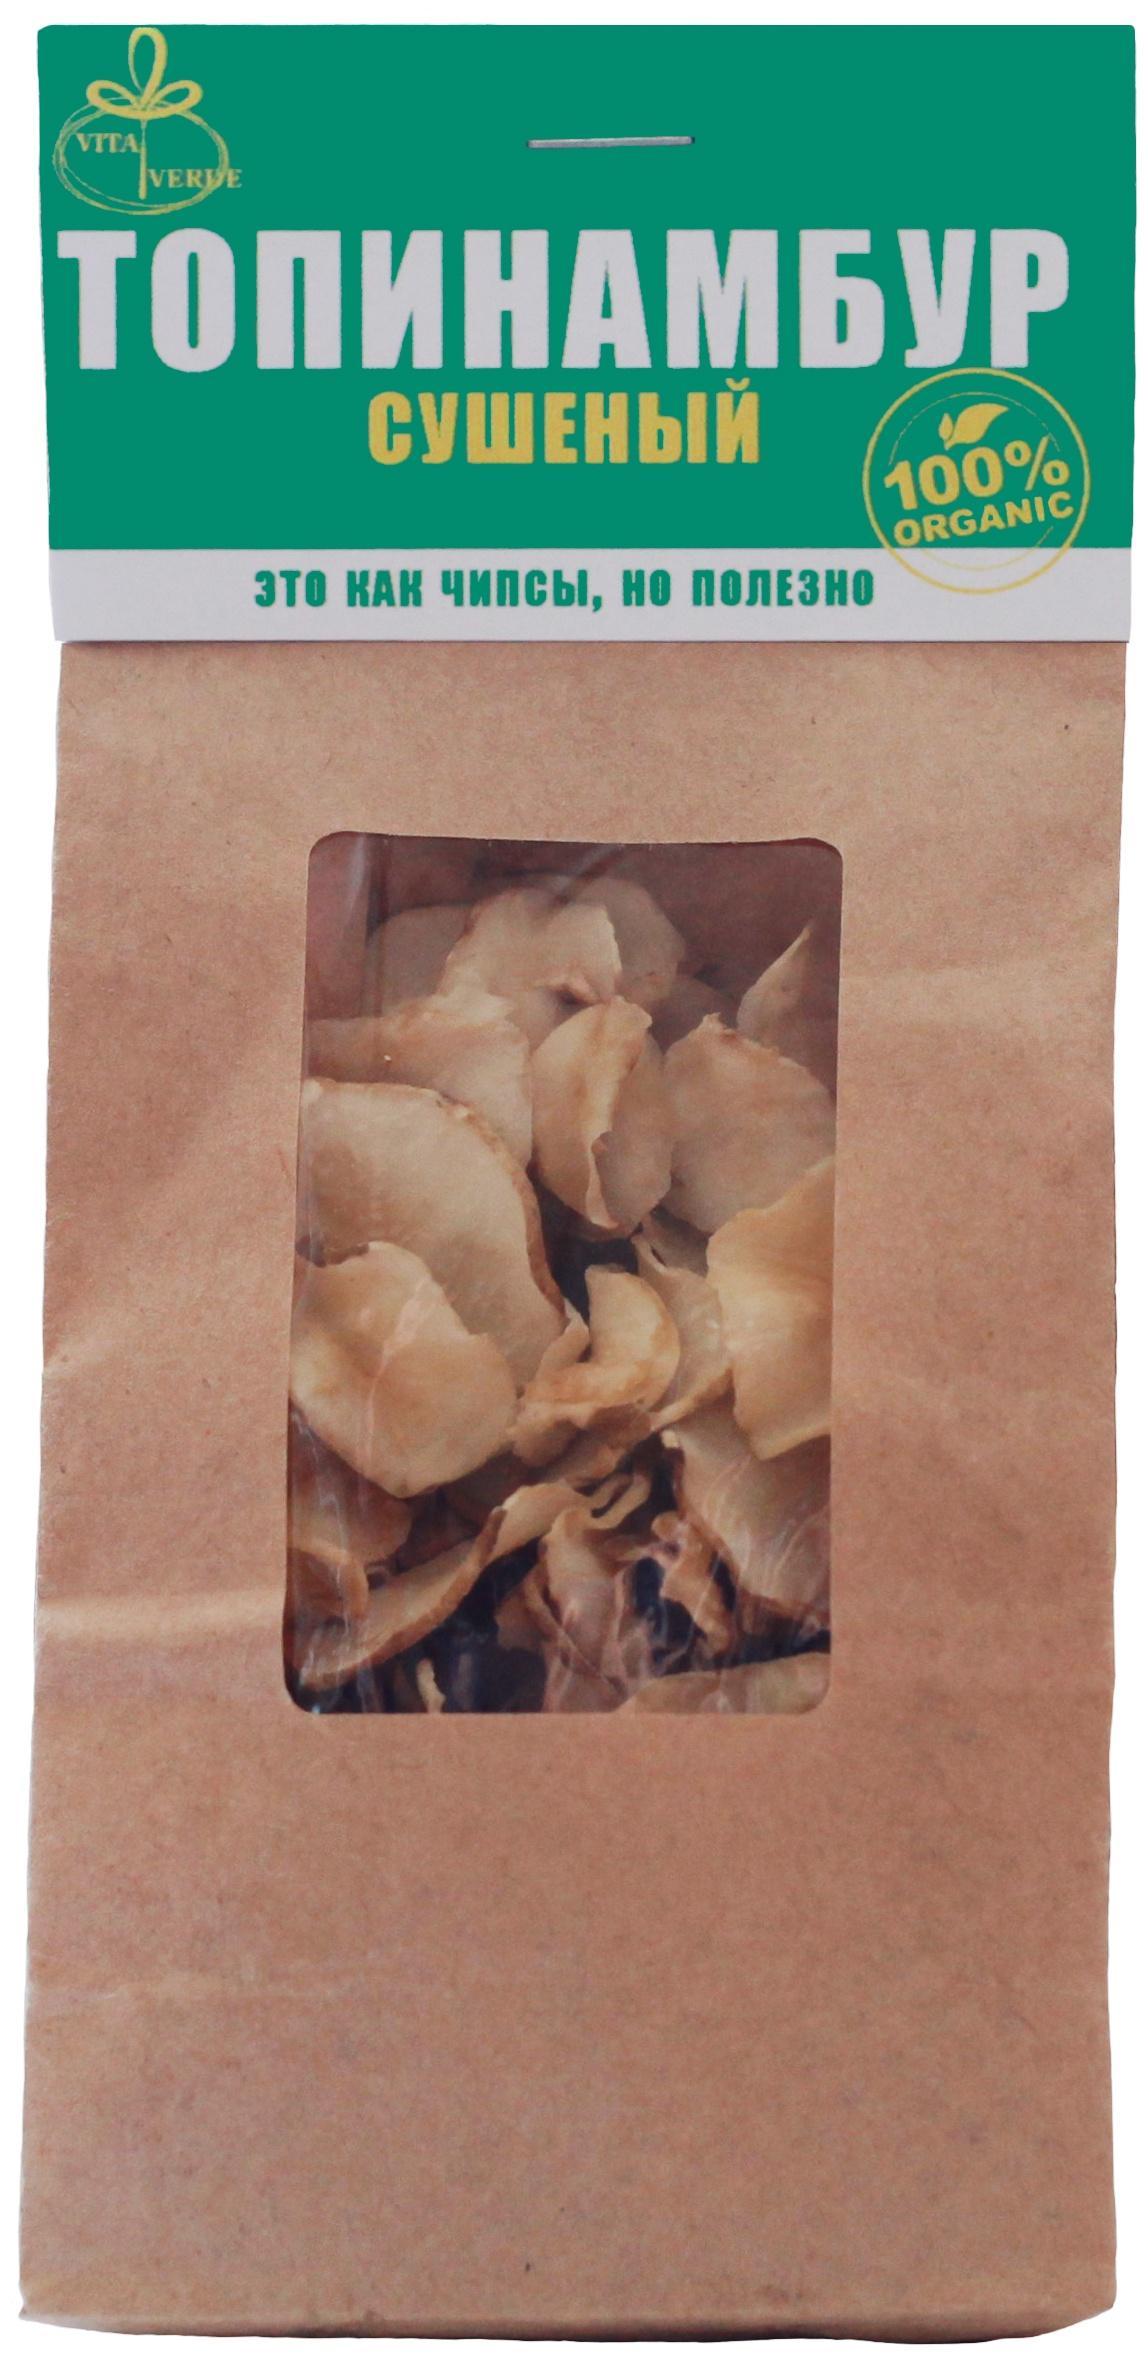 Топинамбур сушенный, Vita Verde, чипсы